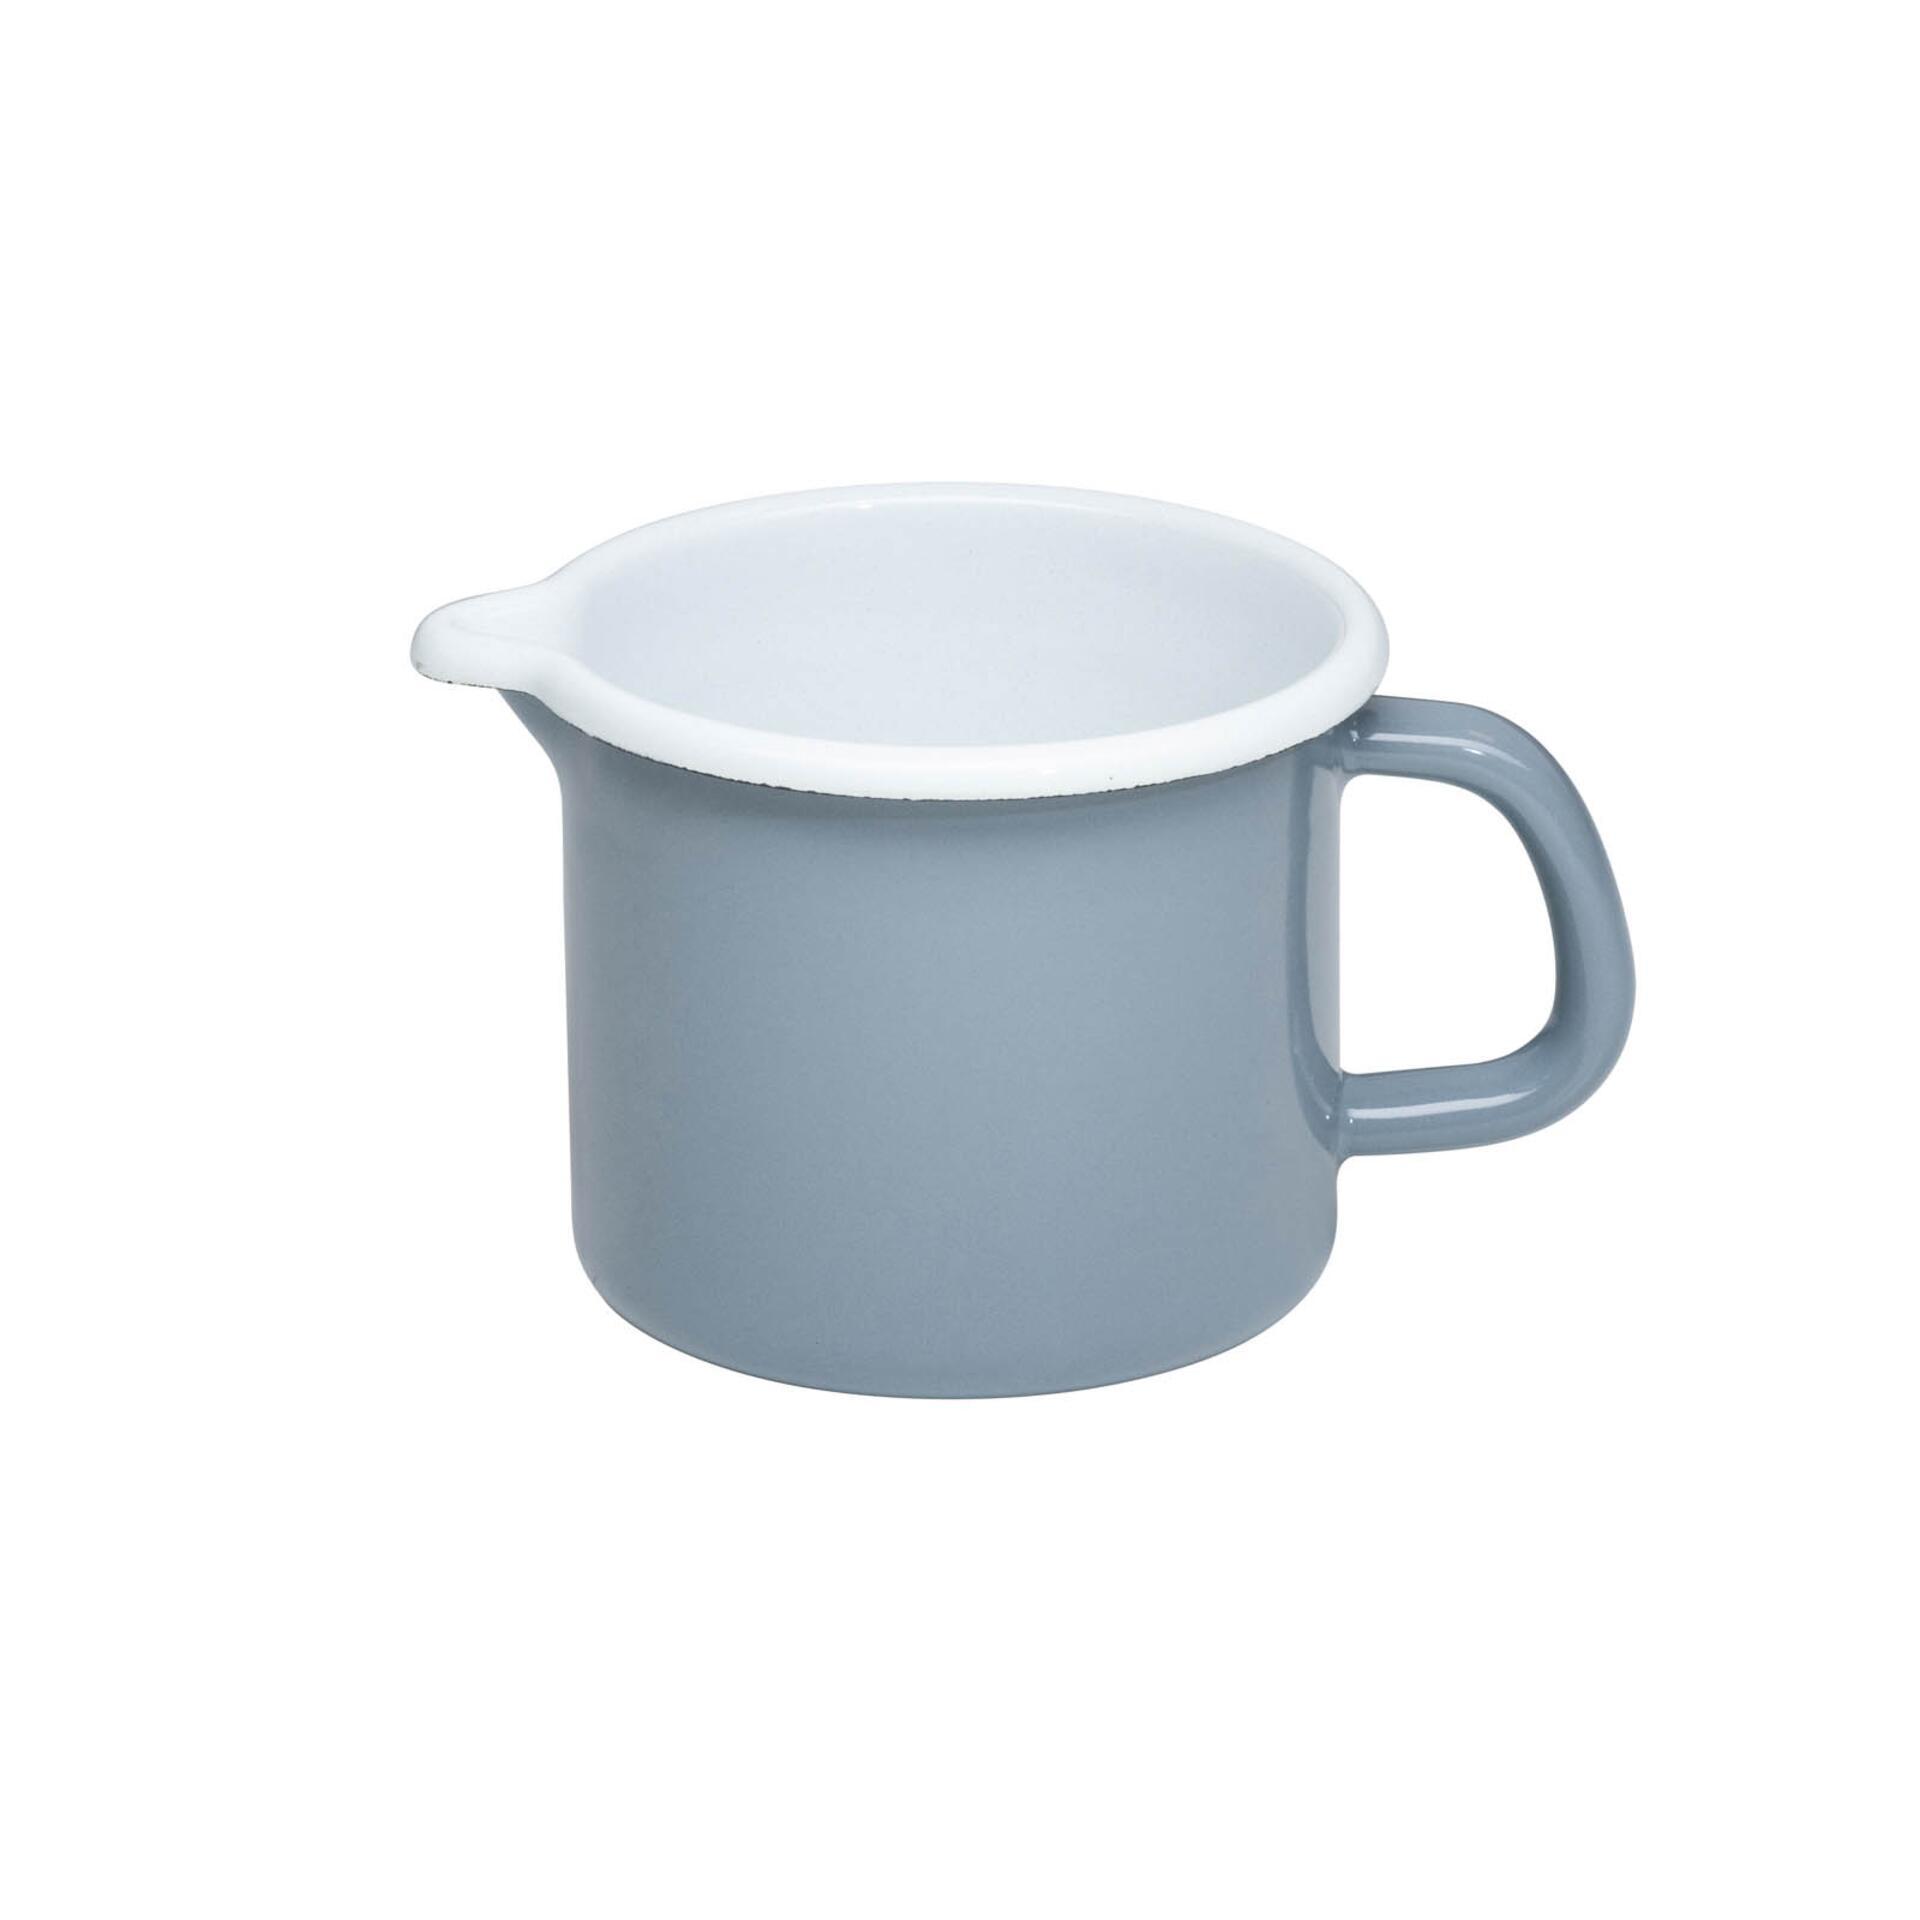 Riess Schnabeltopf 0,75 l Pure Grey